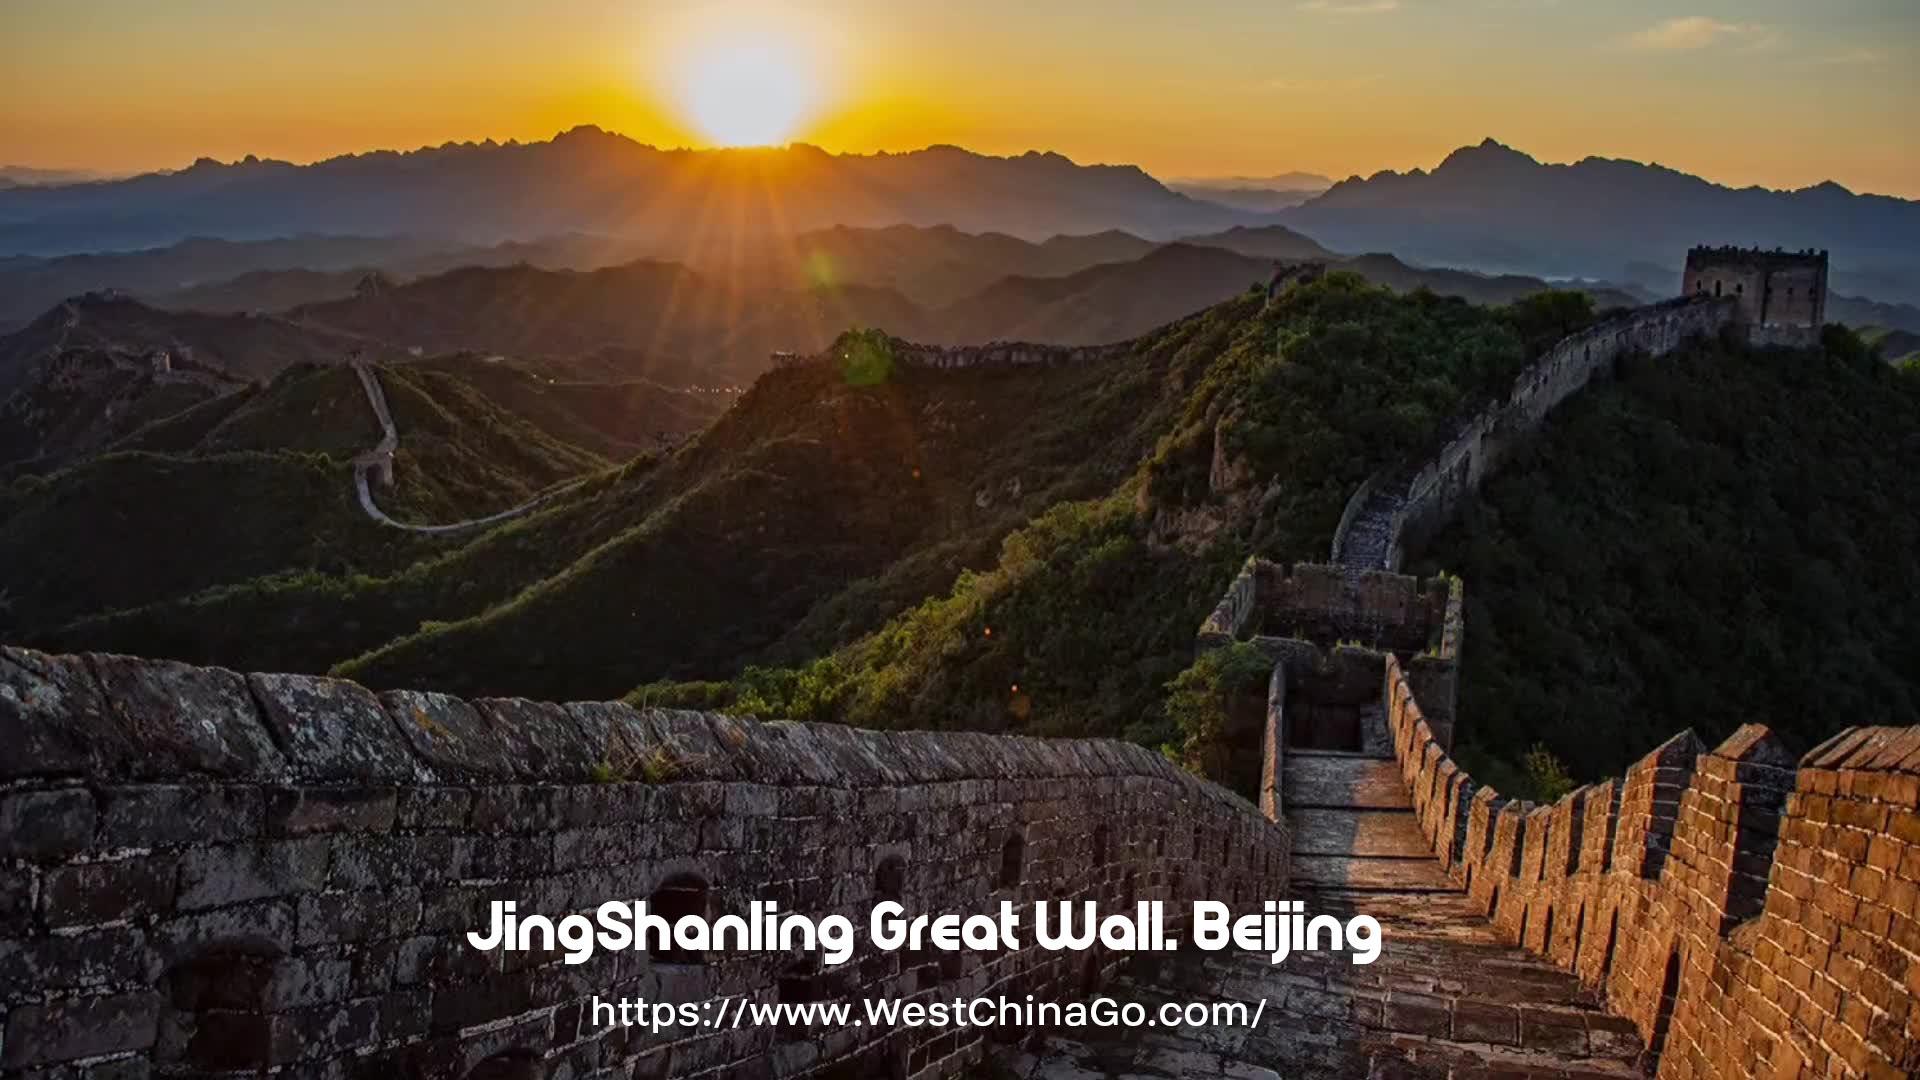 BeiJing jinshanling Great Wall